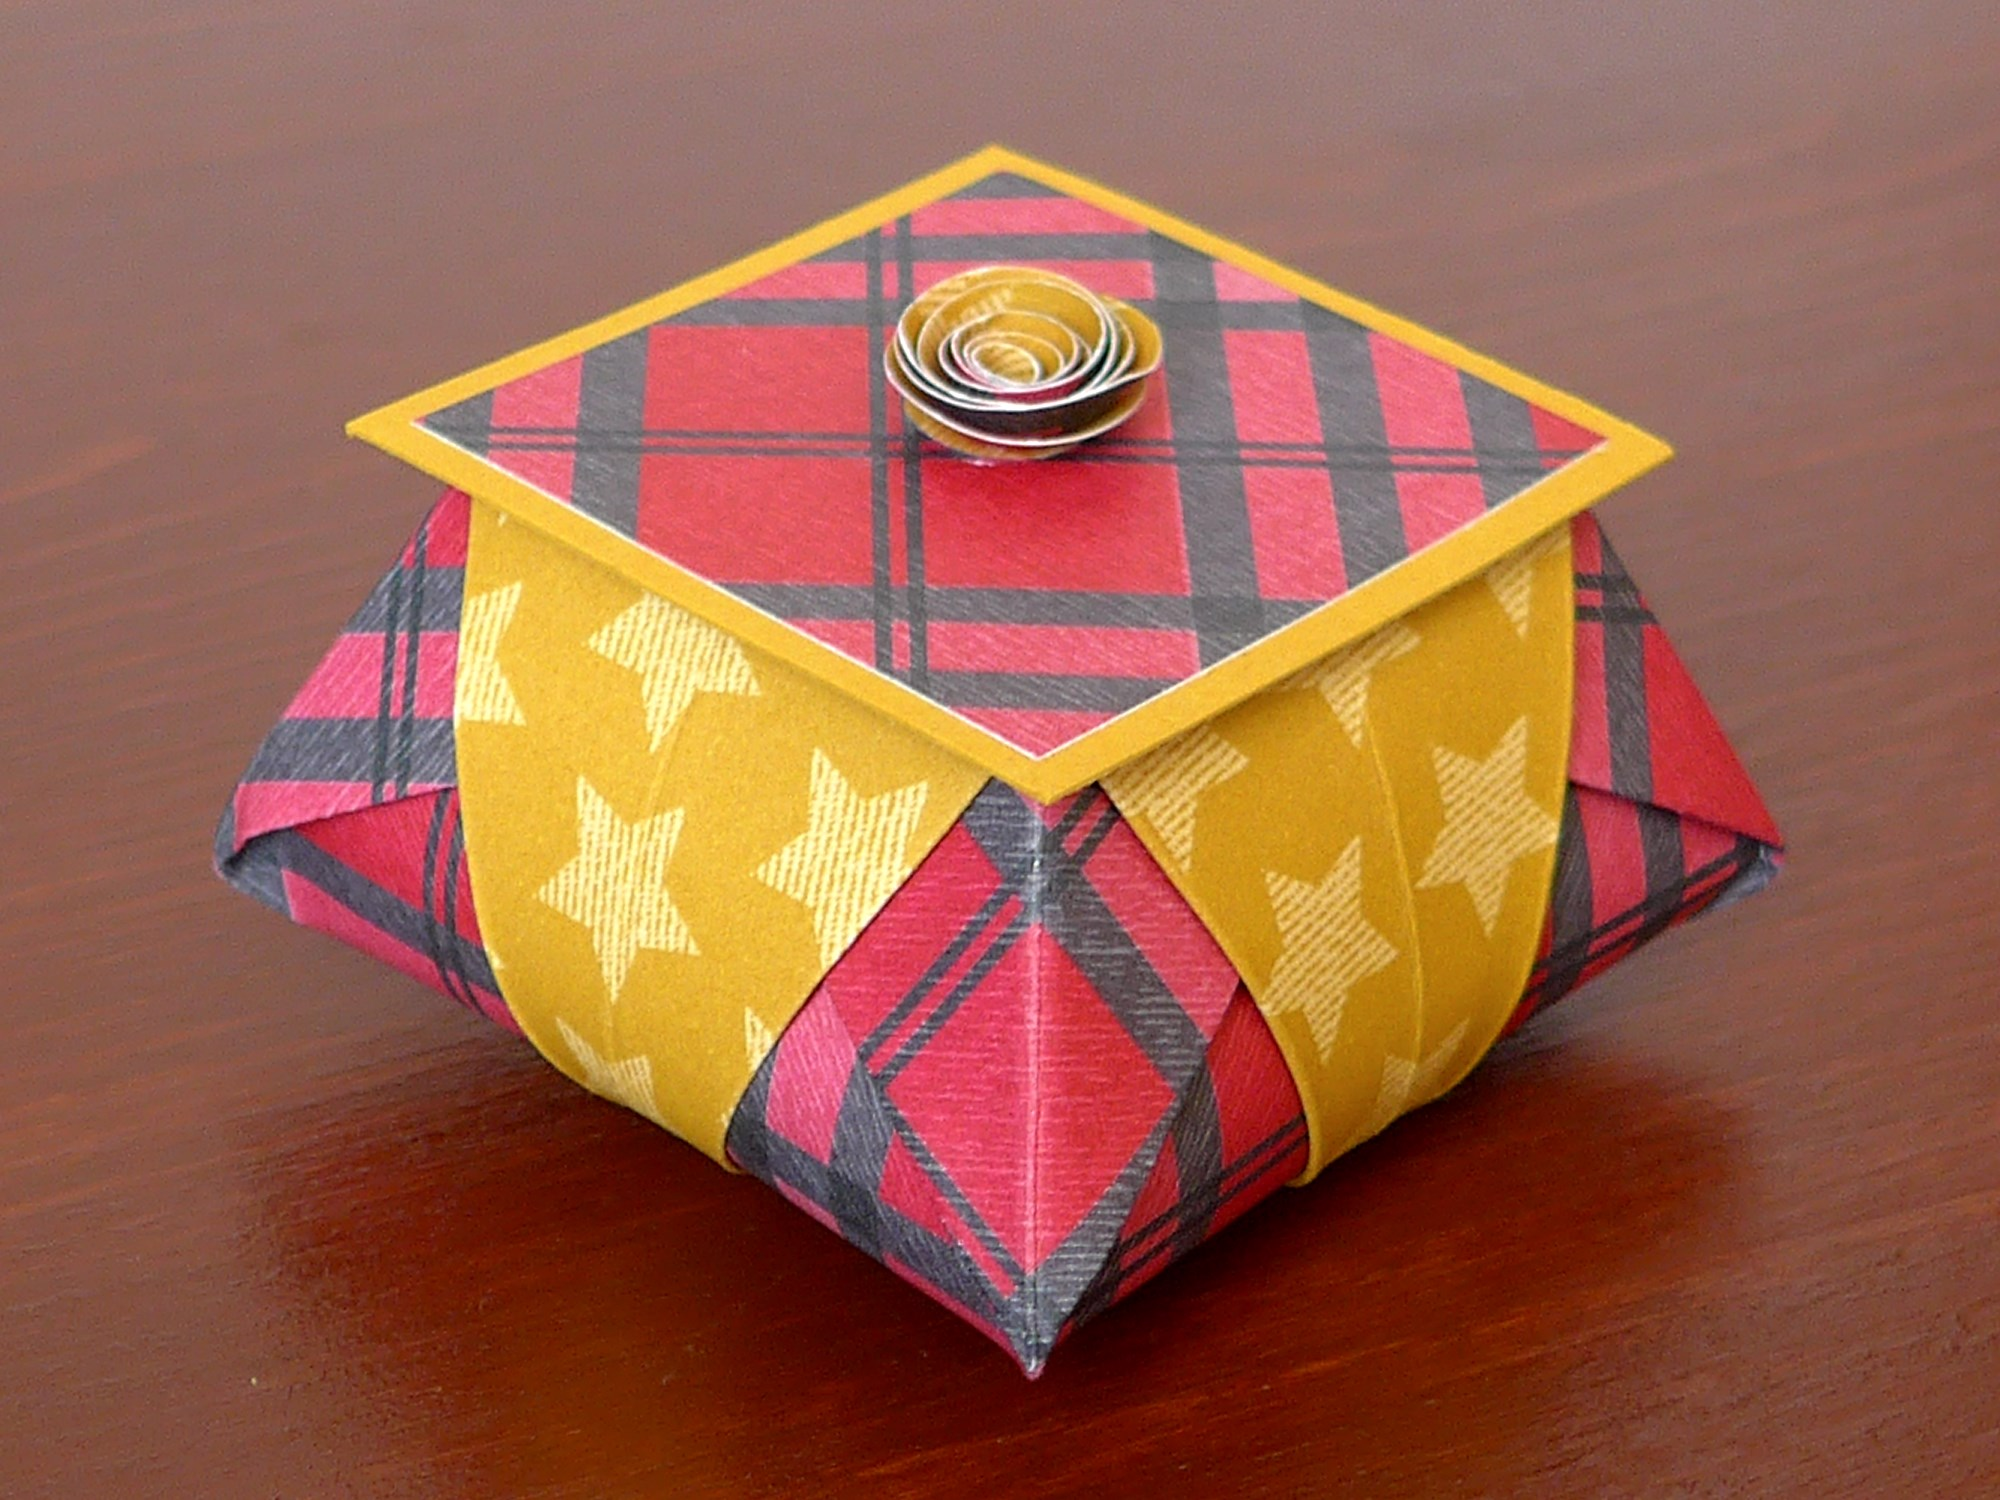 origami star box mit video anleitung kreativwerkstatt. Black Bedroom Furniture Sets. Home Design Ideas